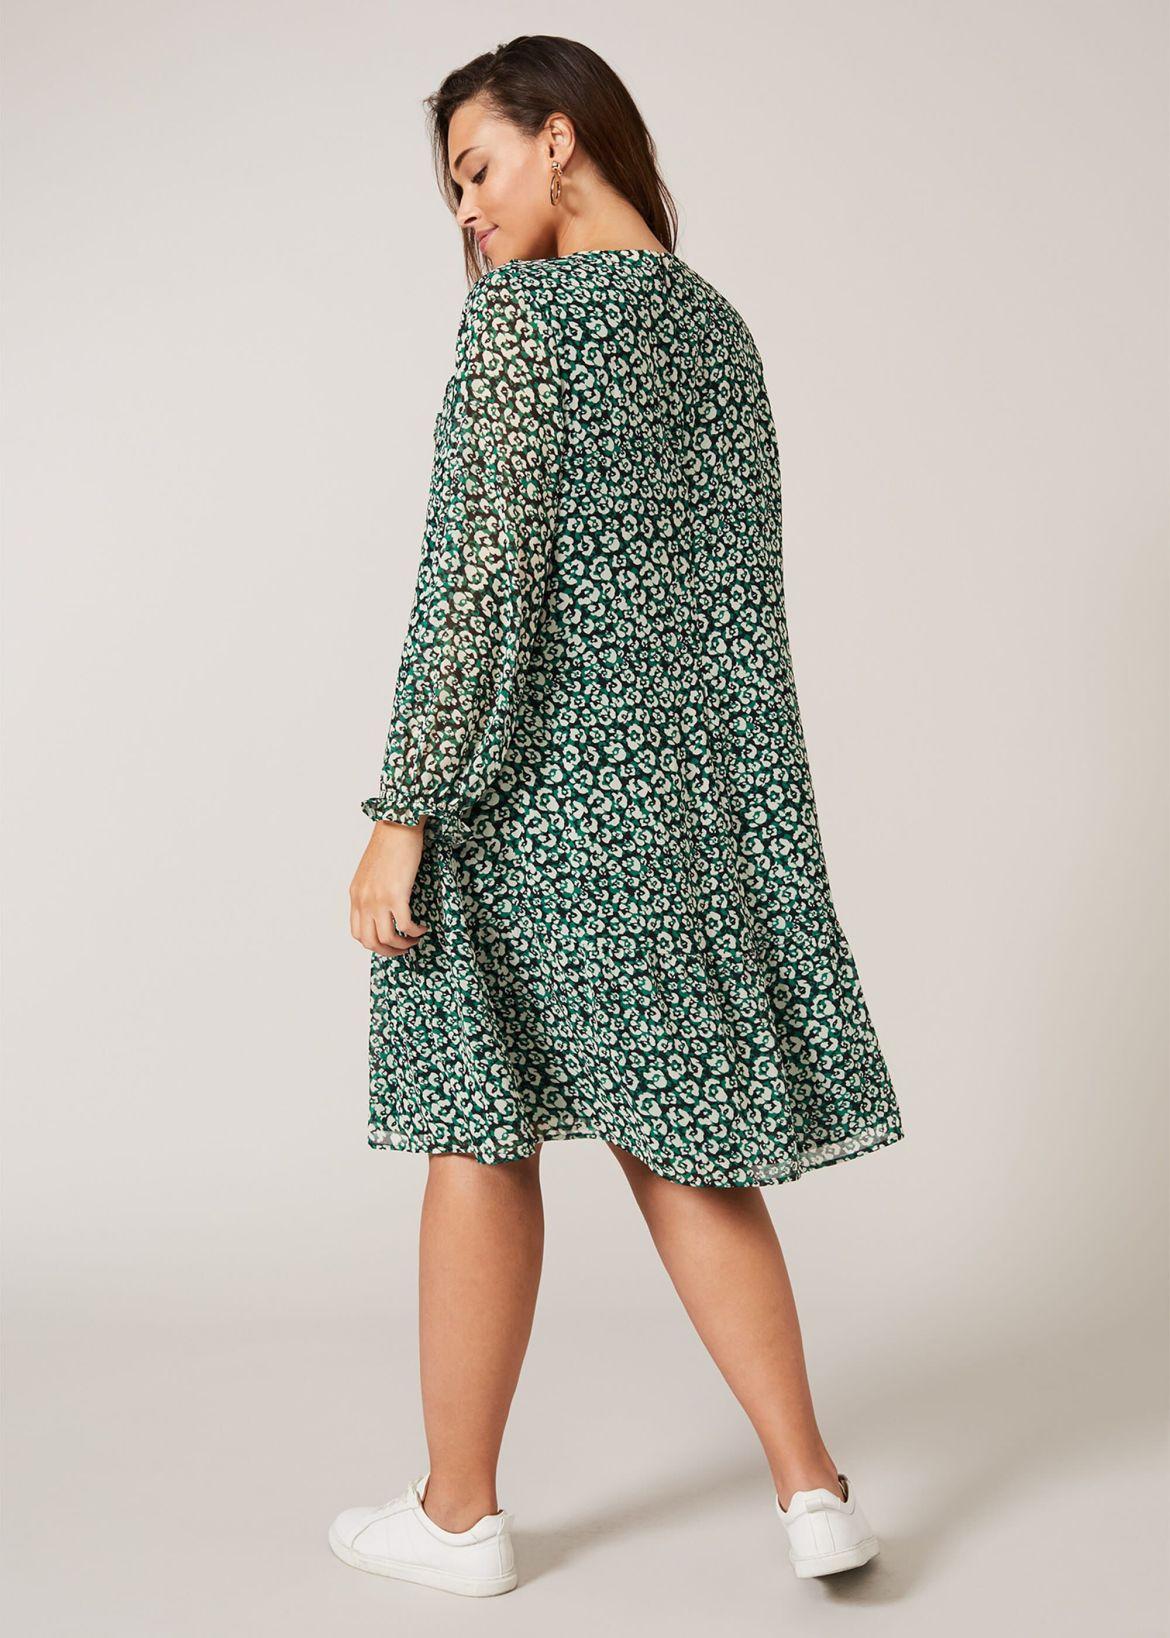 Sawyer Leopard Swing Dress